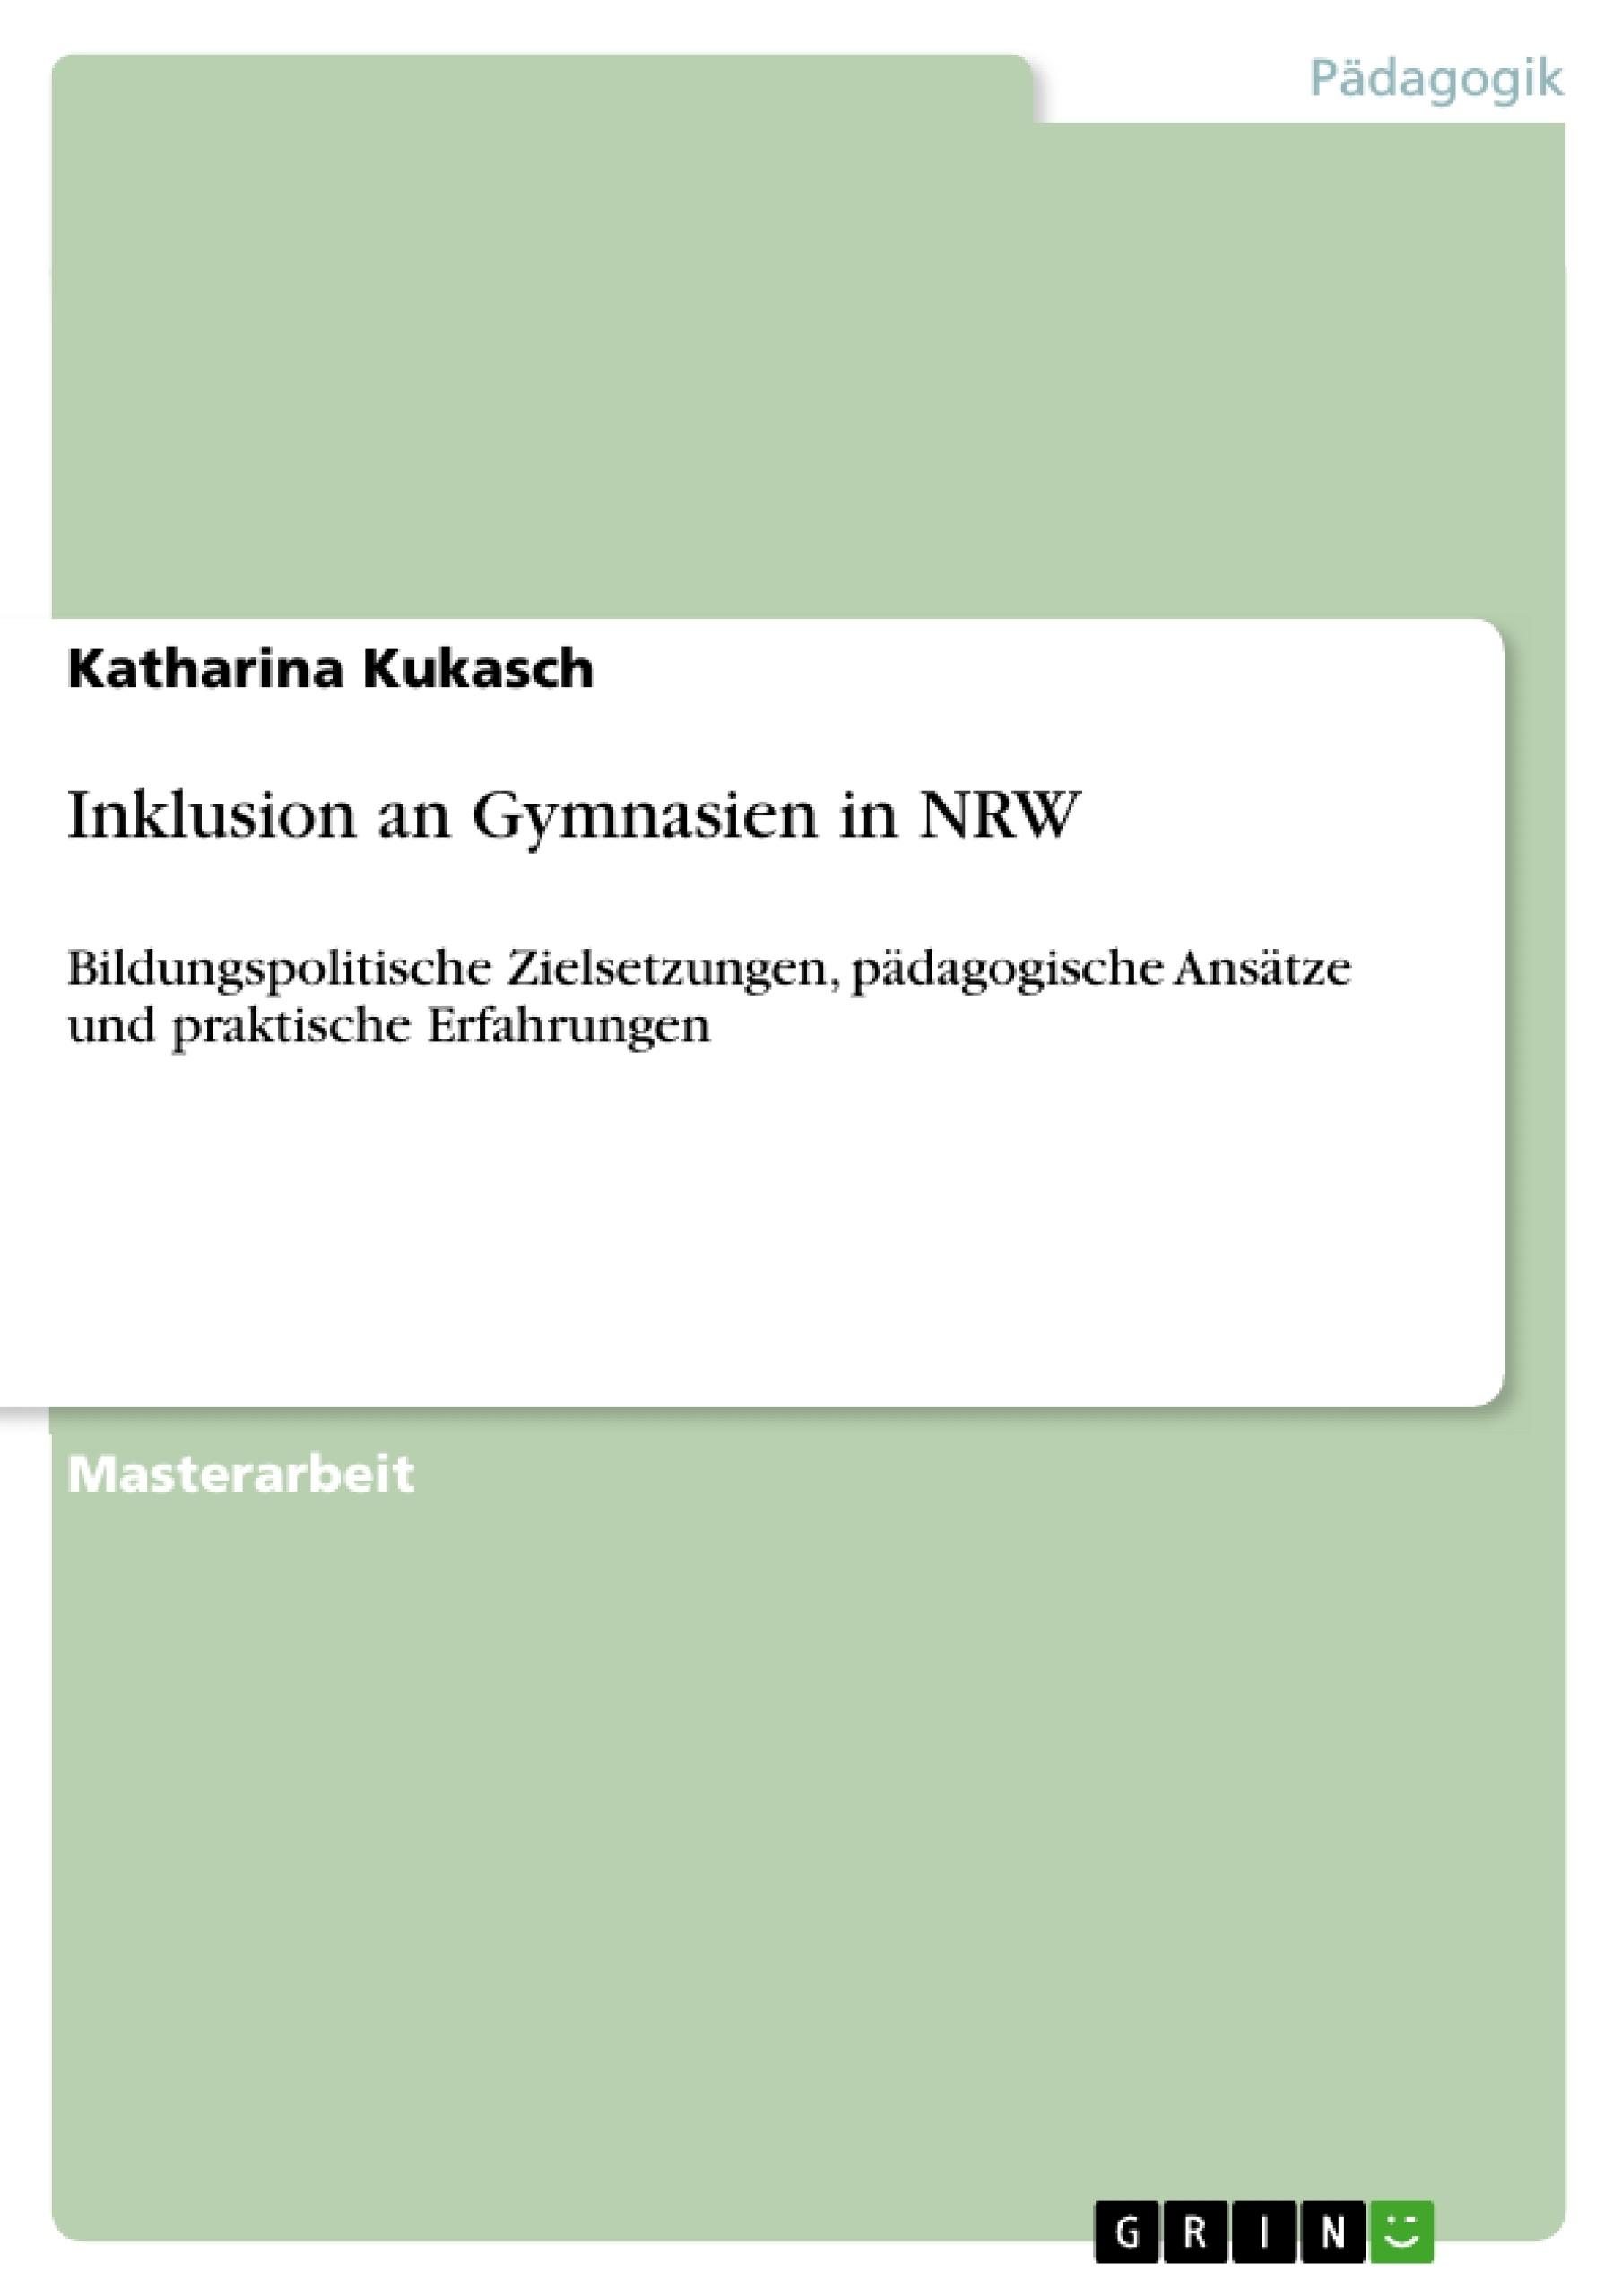 Titel: Inklusion an Gymnasien in NRW